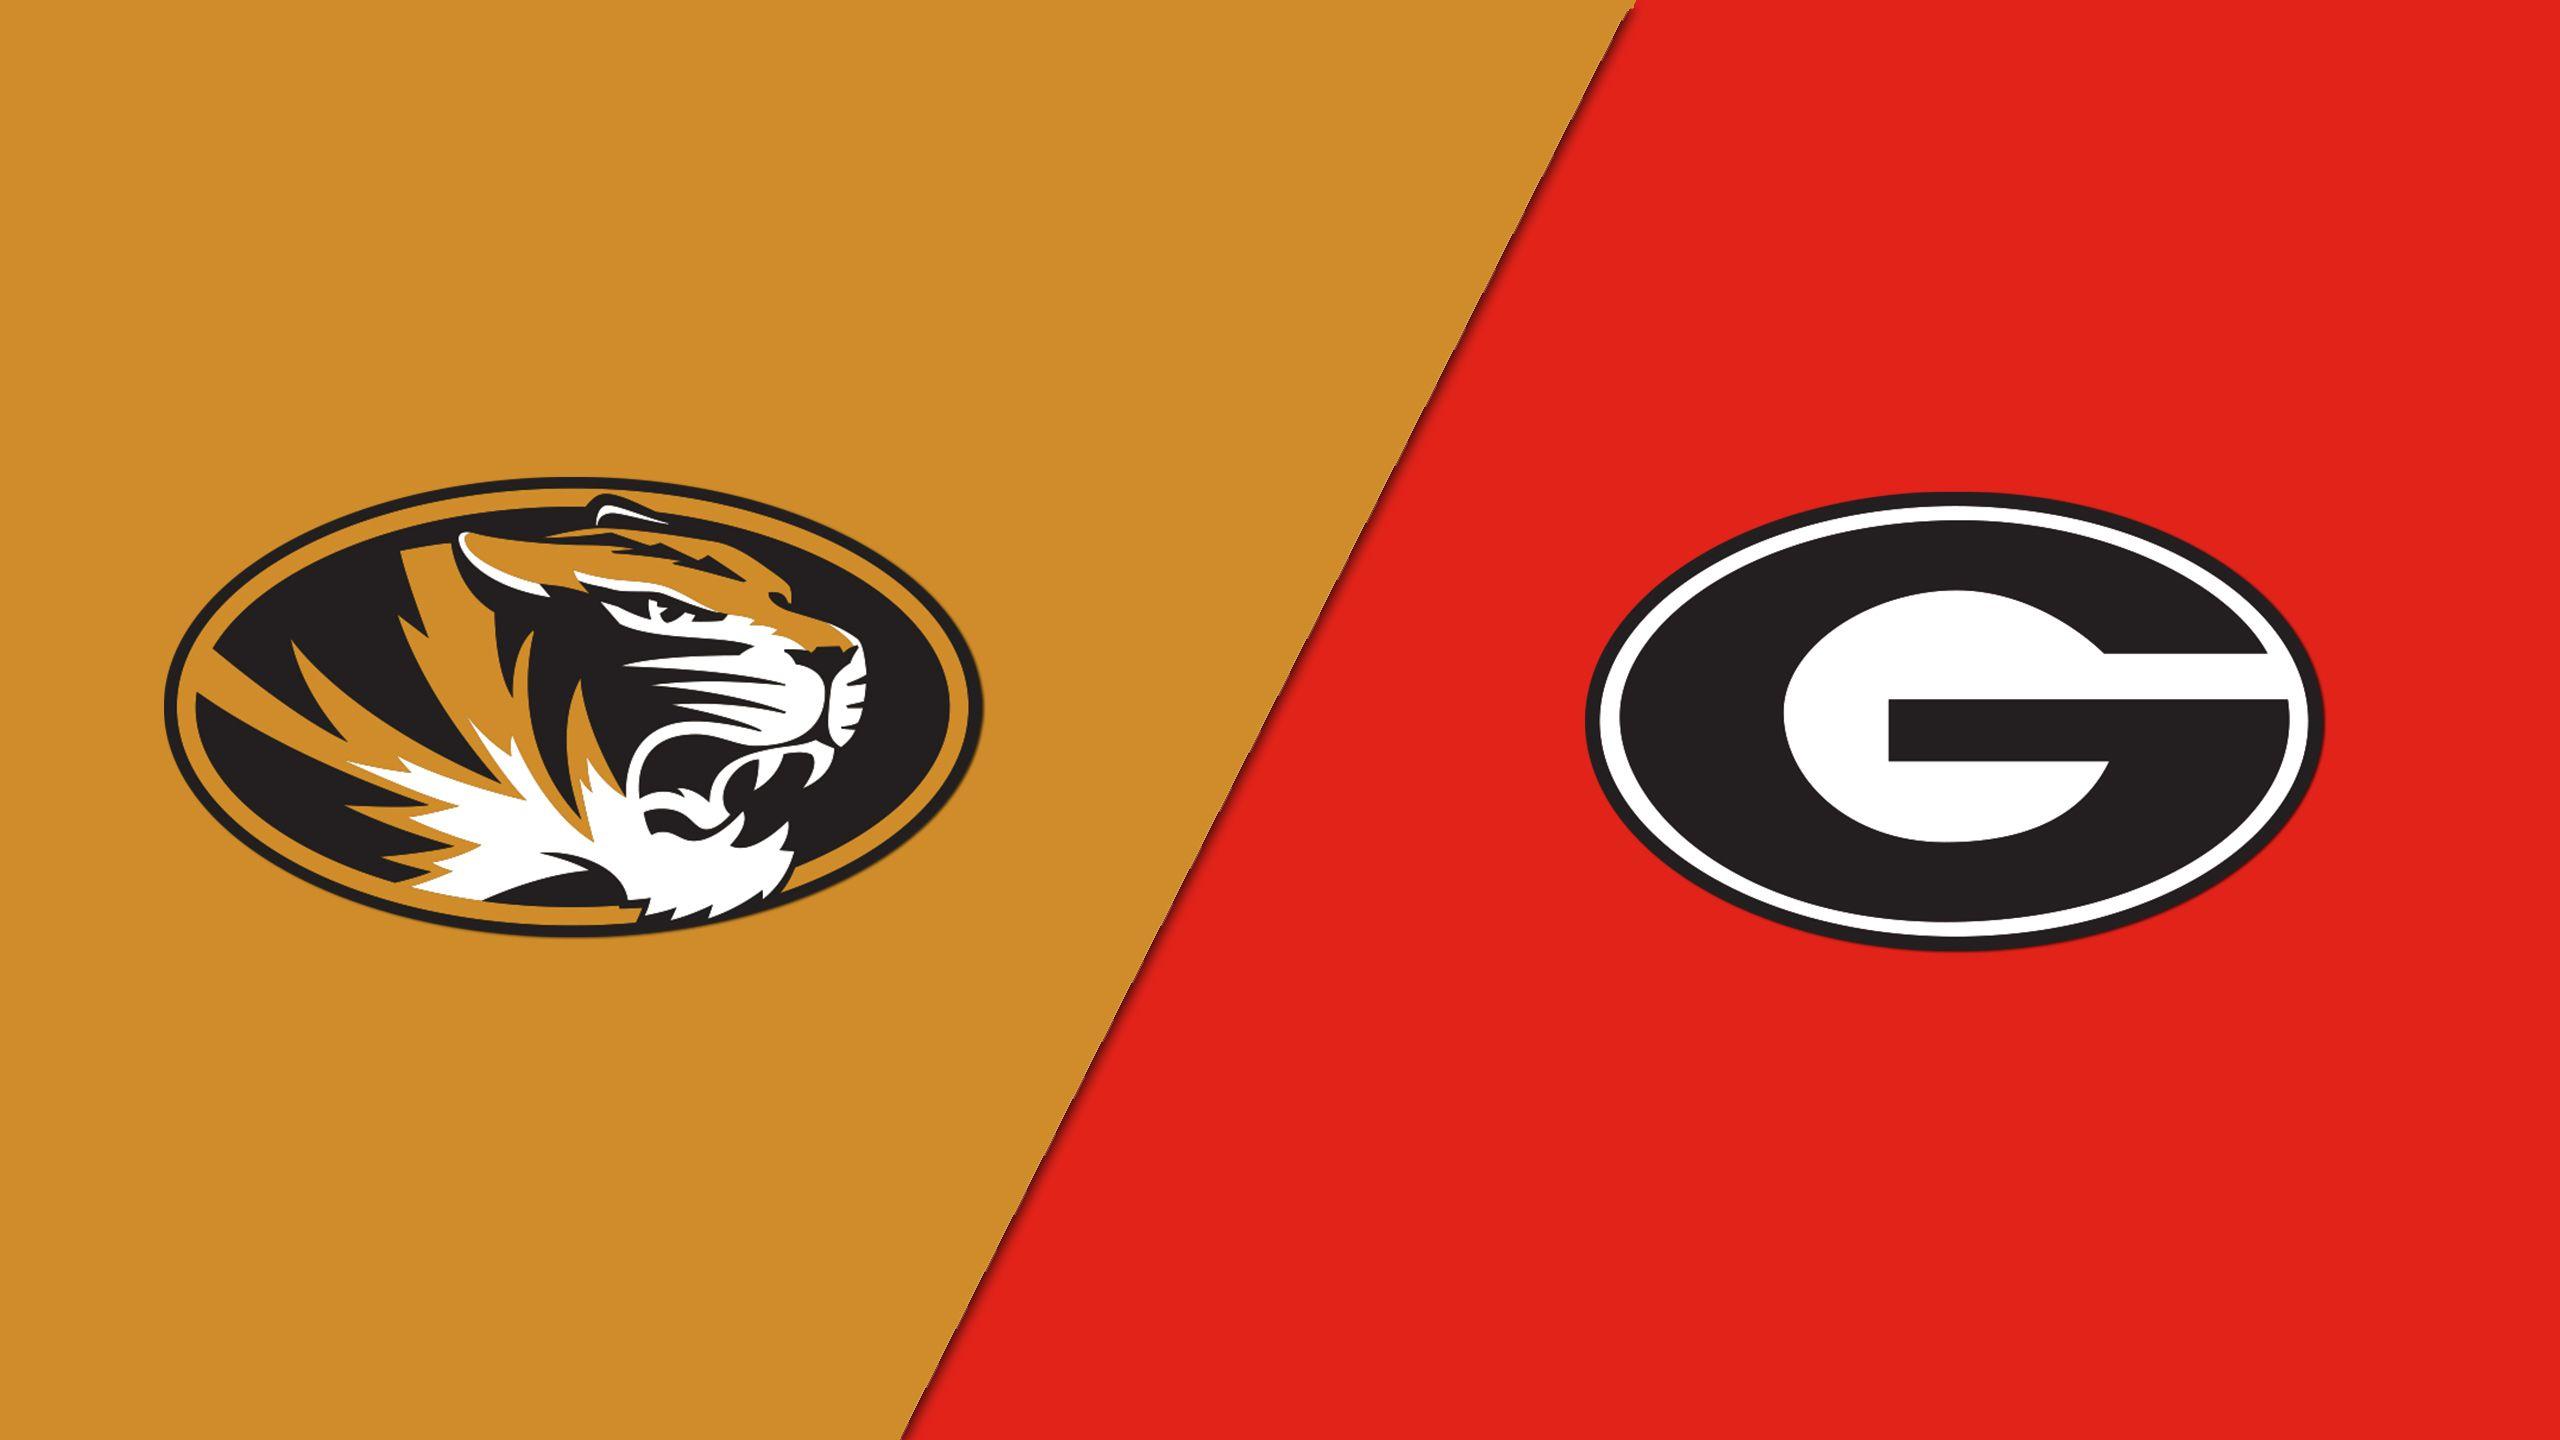 #16 Missouri vs. #18 Georgia (Quarterfinal #4) (re-air)